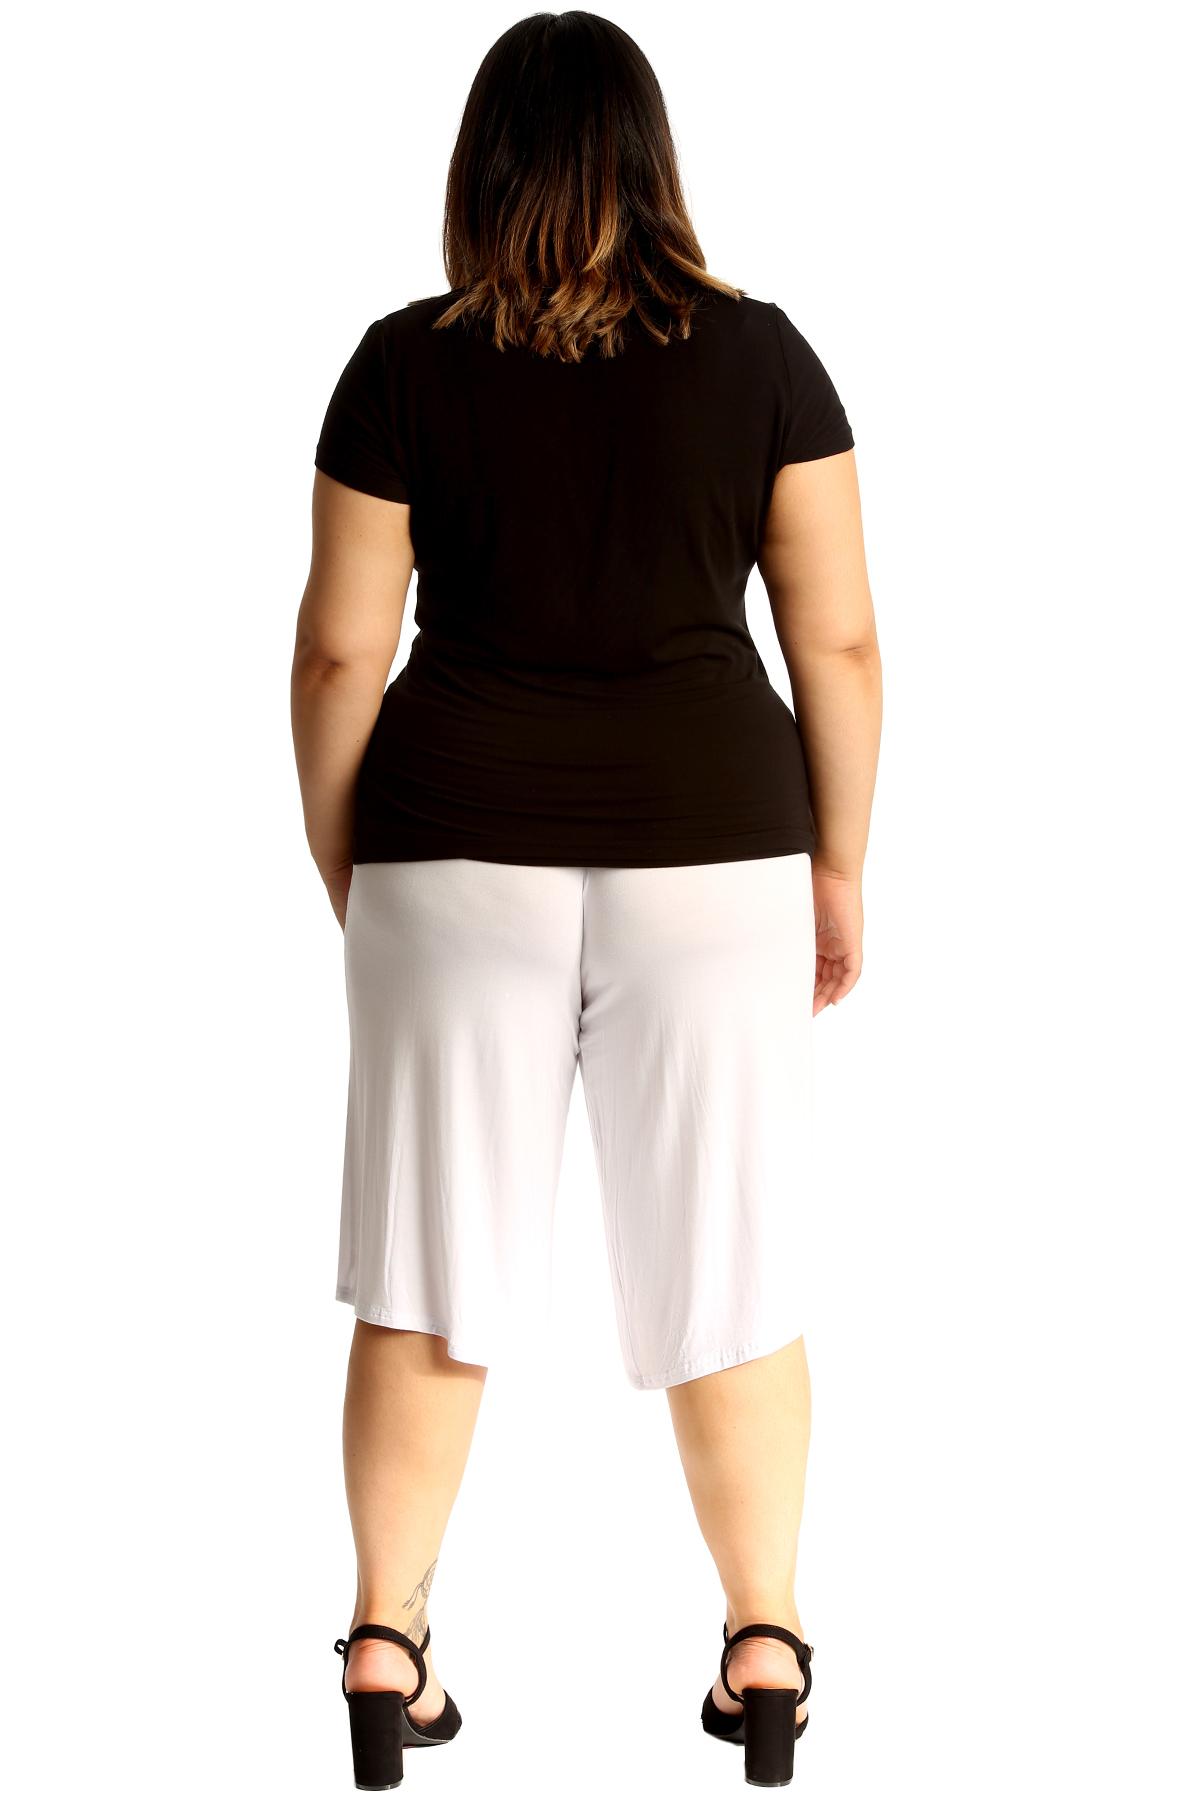 New-Womens-Plus-Size-Culottes-Ladies-Plain-Shorts-Palazzo-Elastic-Pants-Summer thumbnail 44